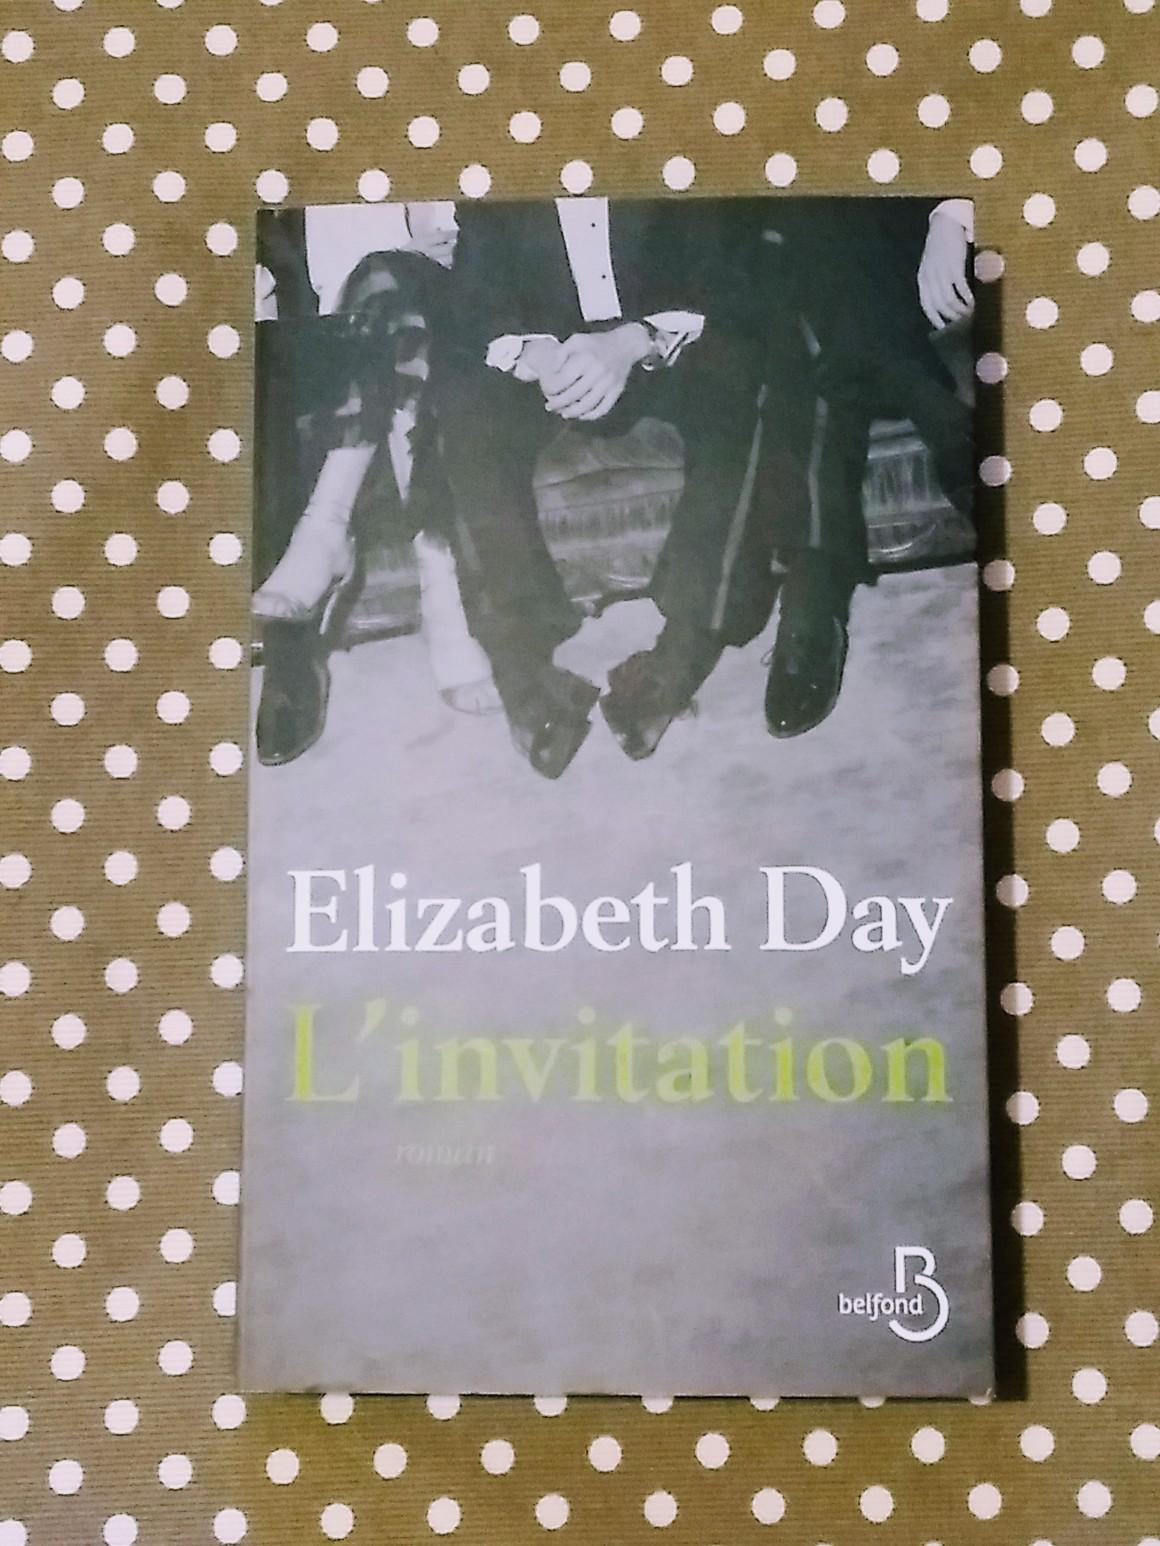 L'invitation.jpg